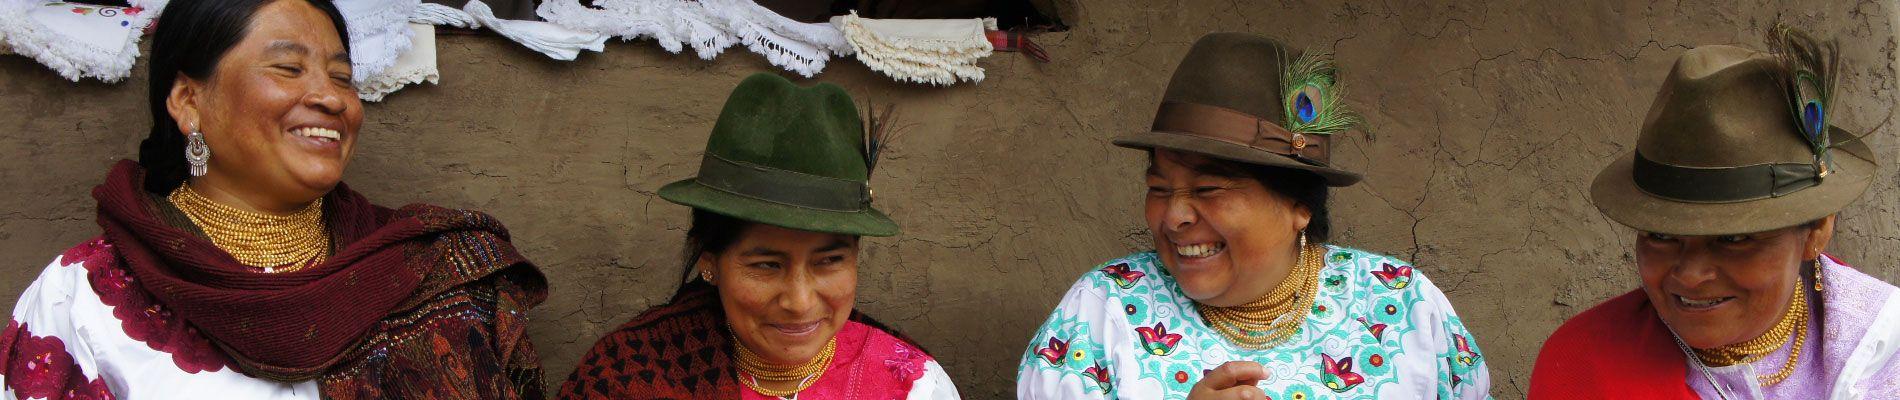 equateur-broderies-san-clemente